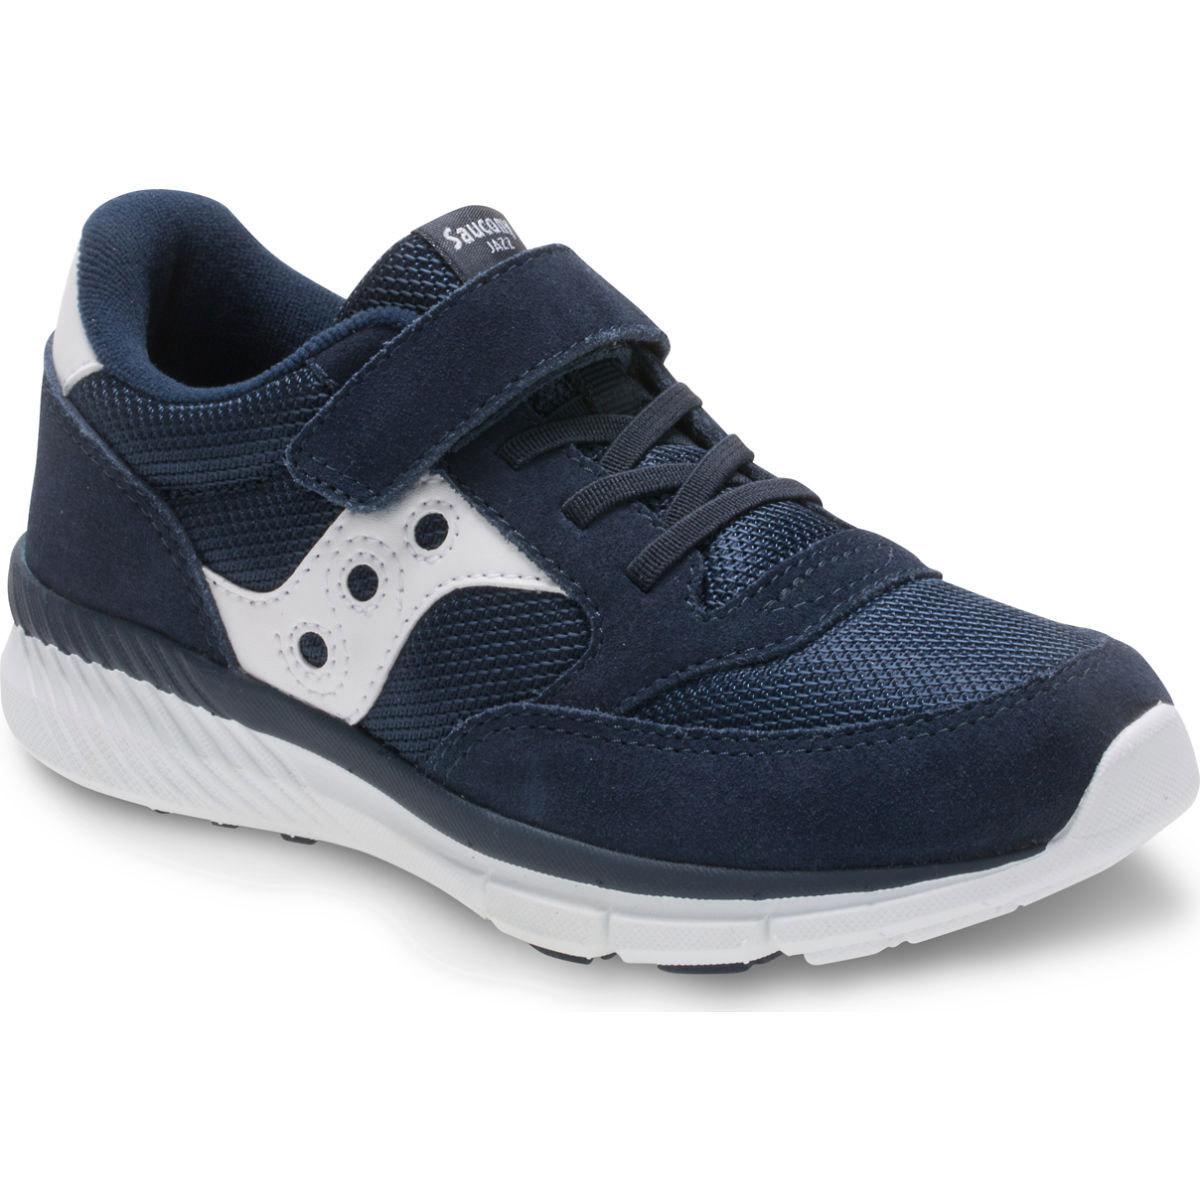 Saucony Little Boys' Jazz Lite A/c Sneakers - Blue, 2